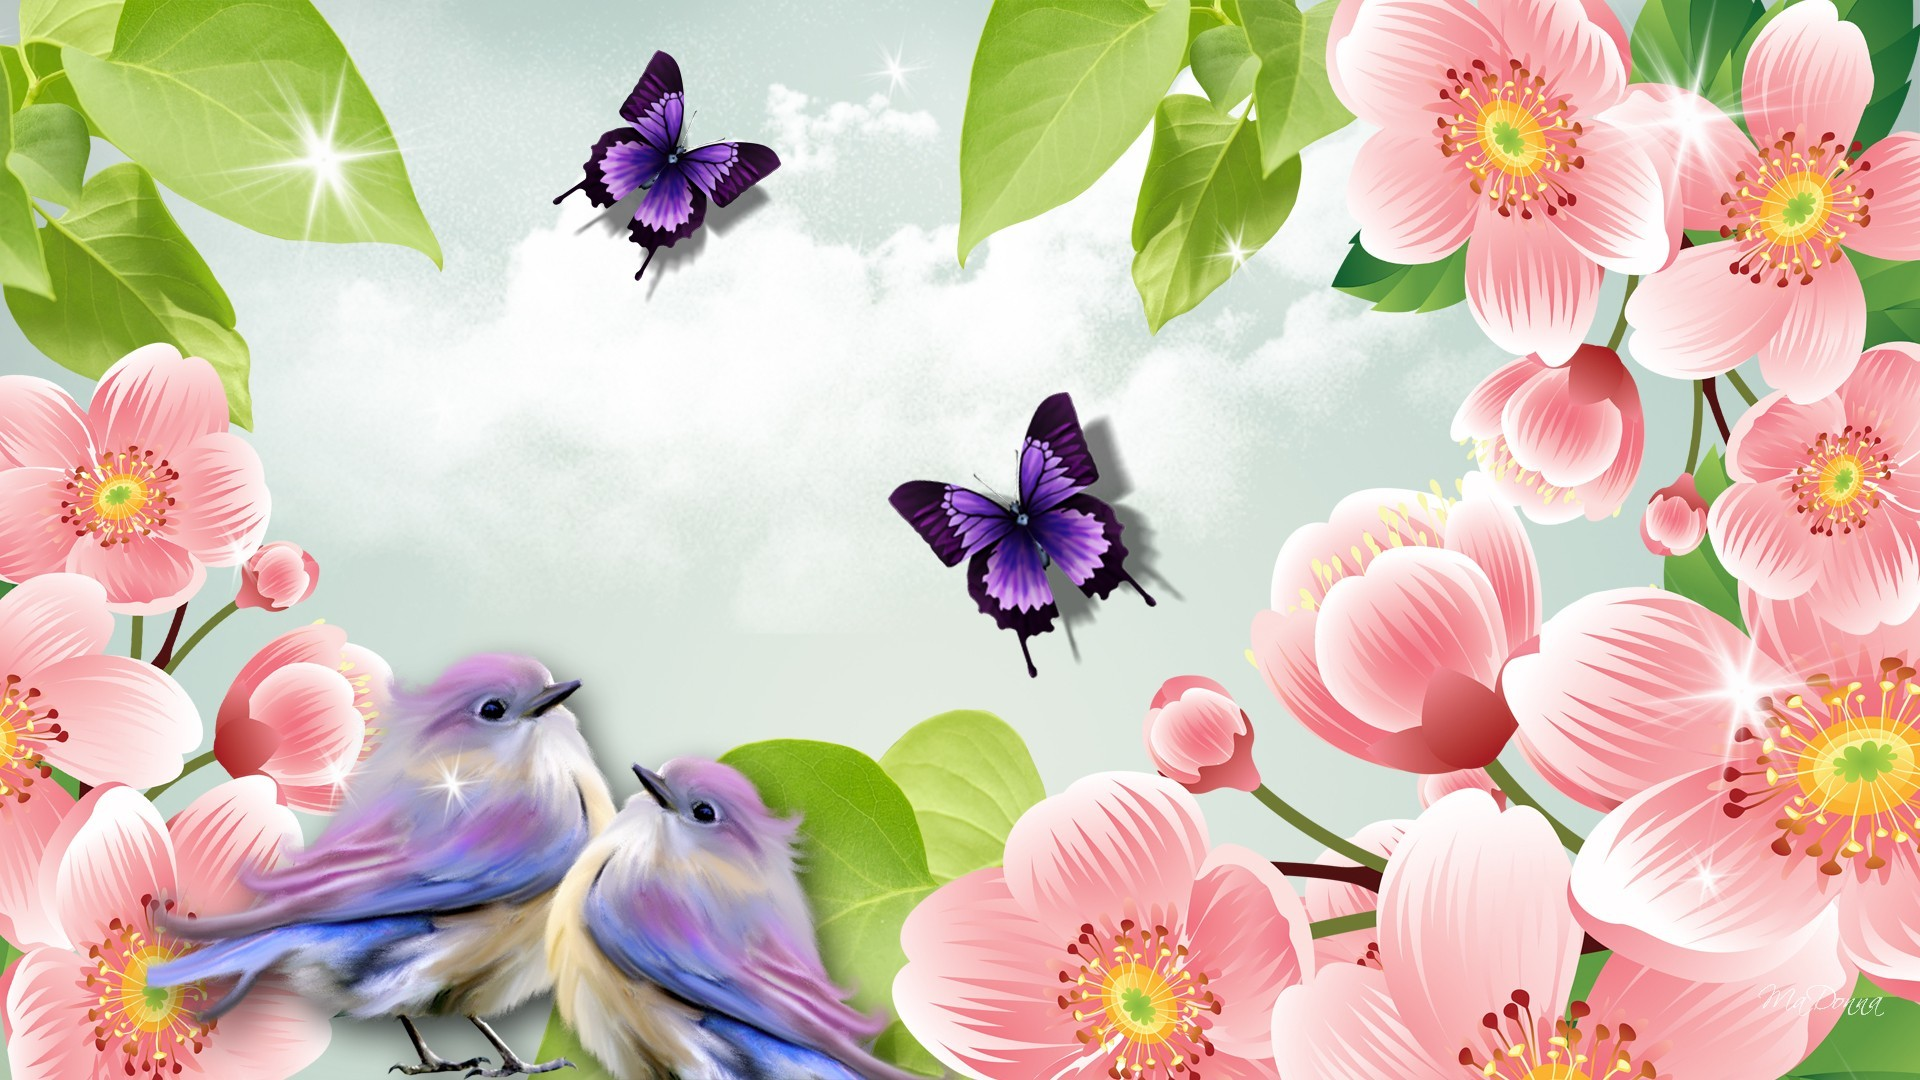 1138859 download free cute summer wallpaper